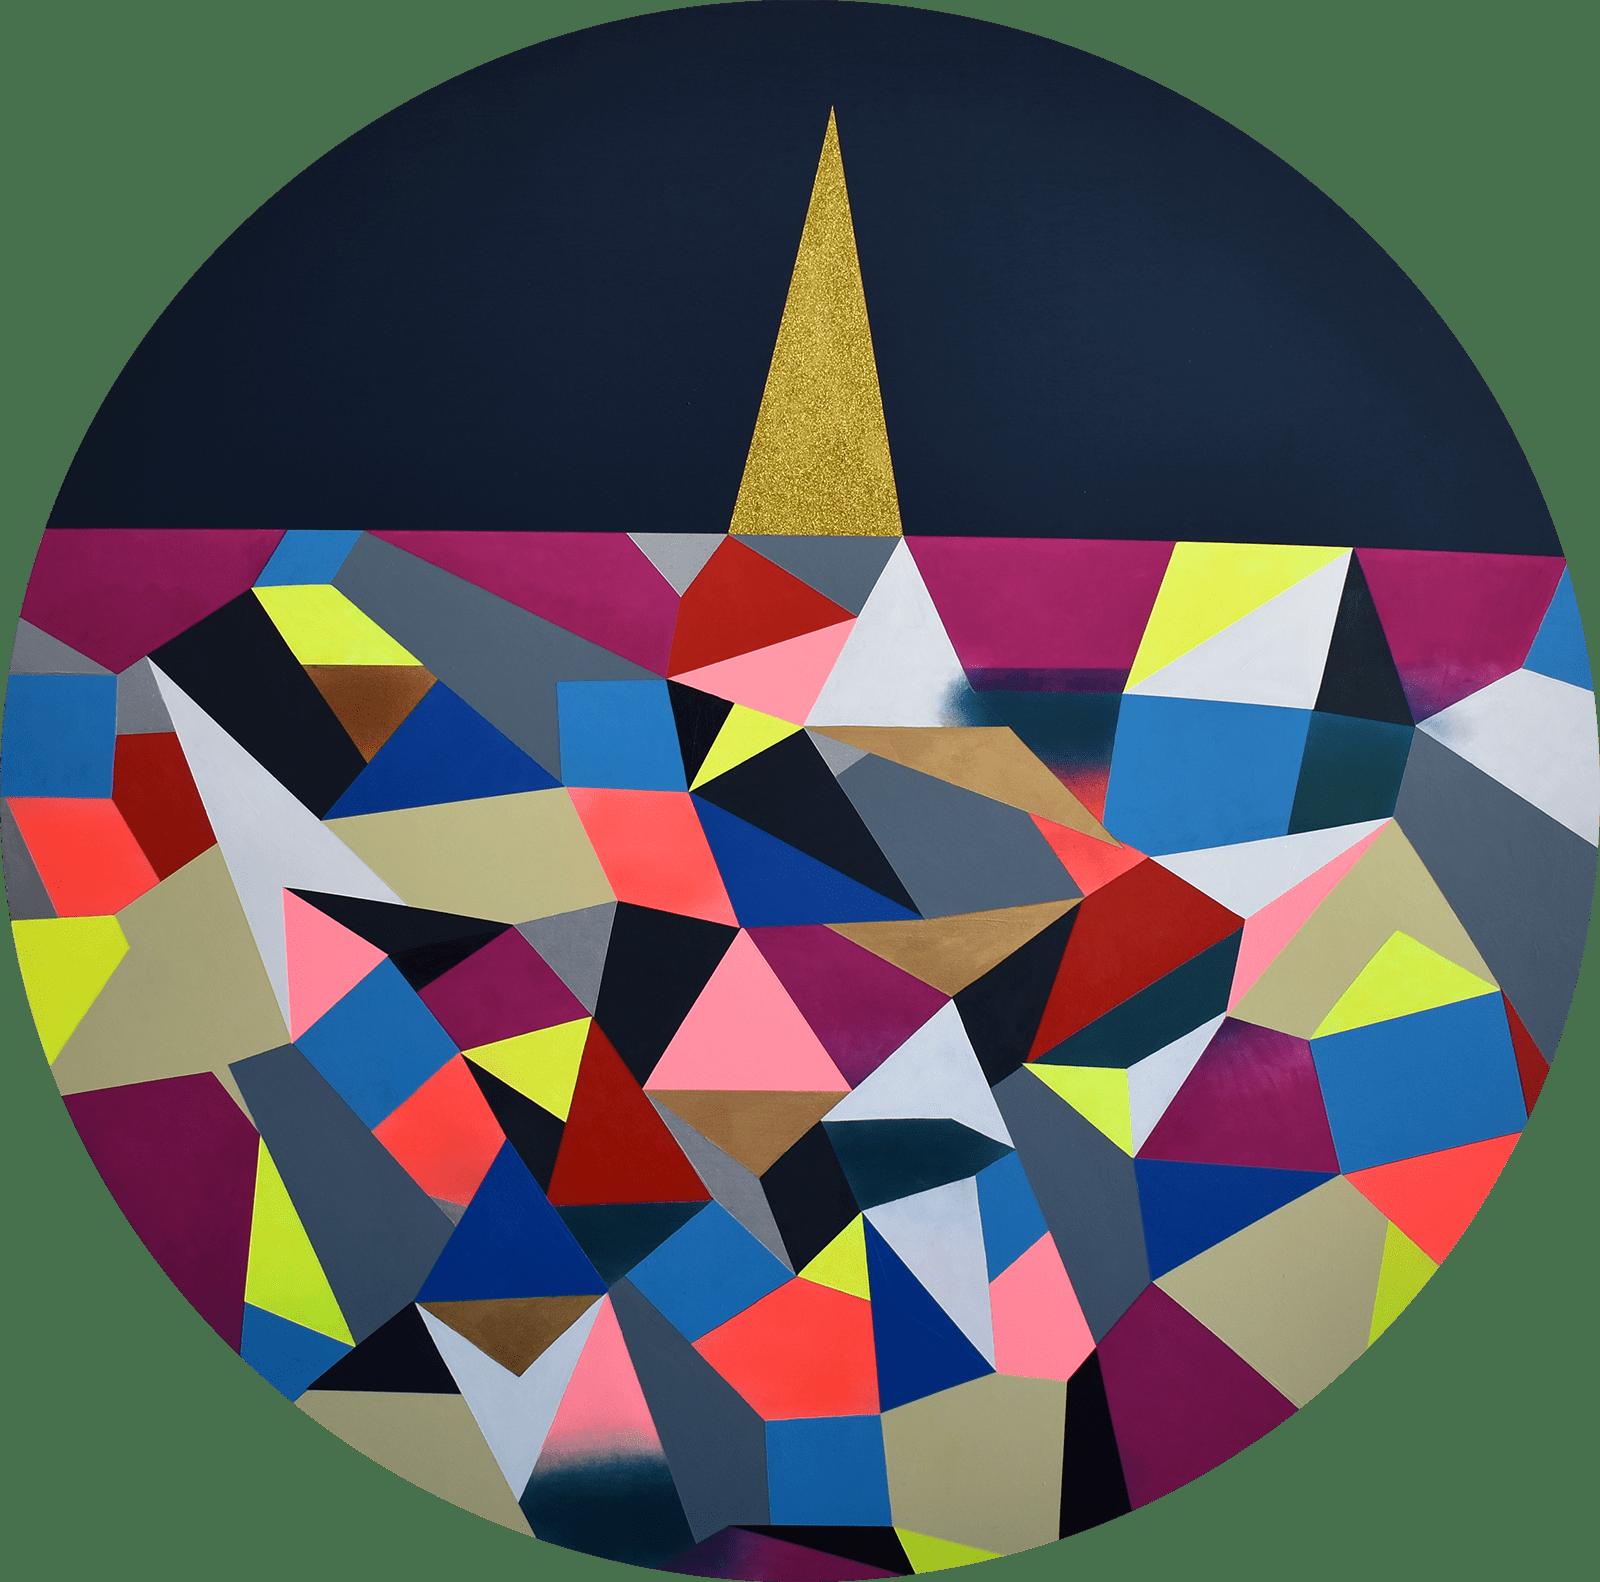 Adia Millett, Roots, 2020